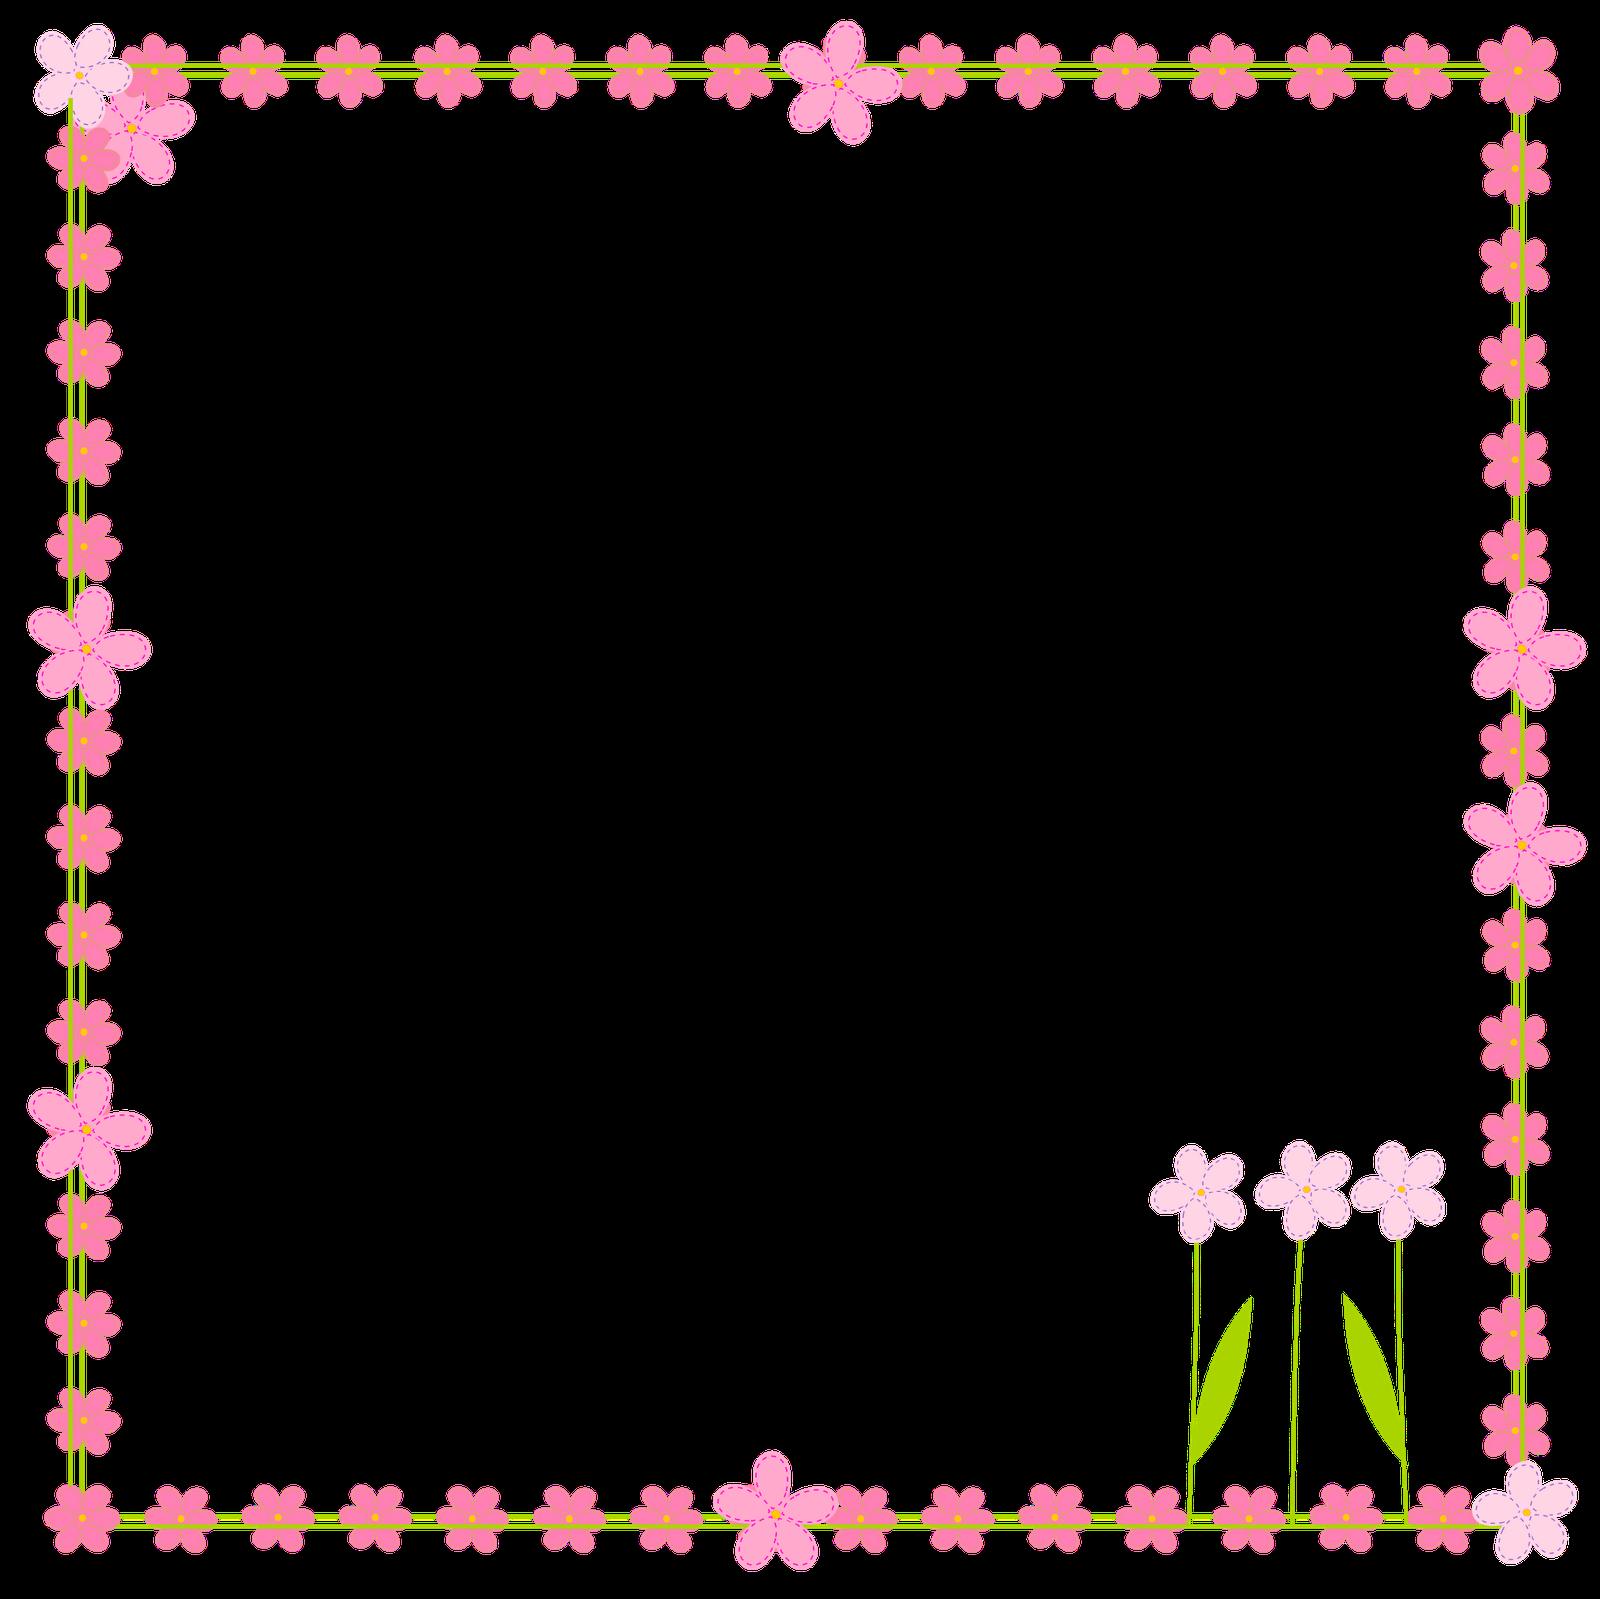 1600x1599 Clip Art Borders And Frames Clipart